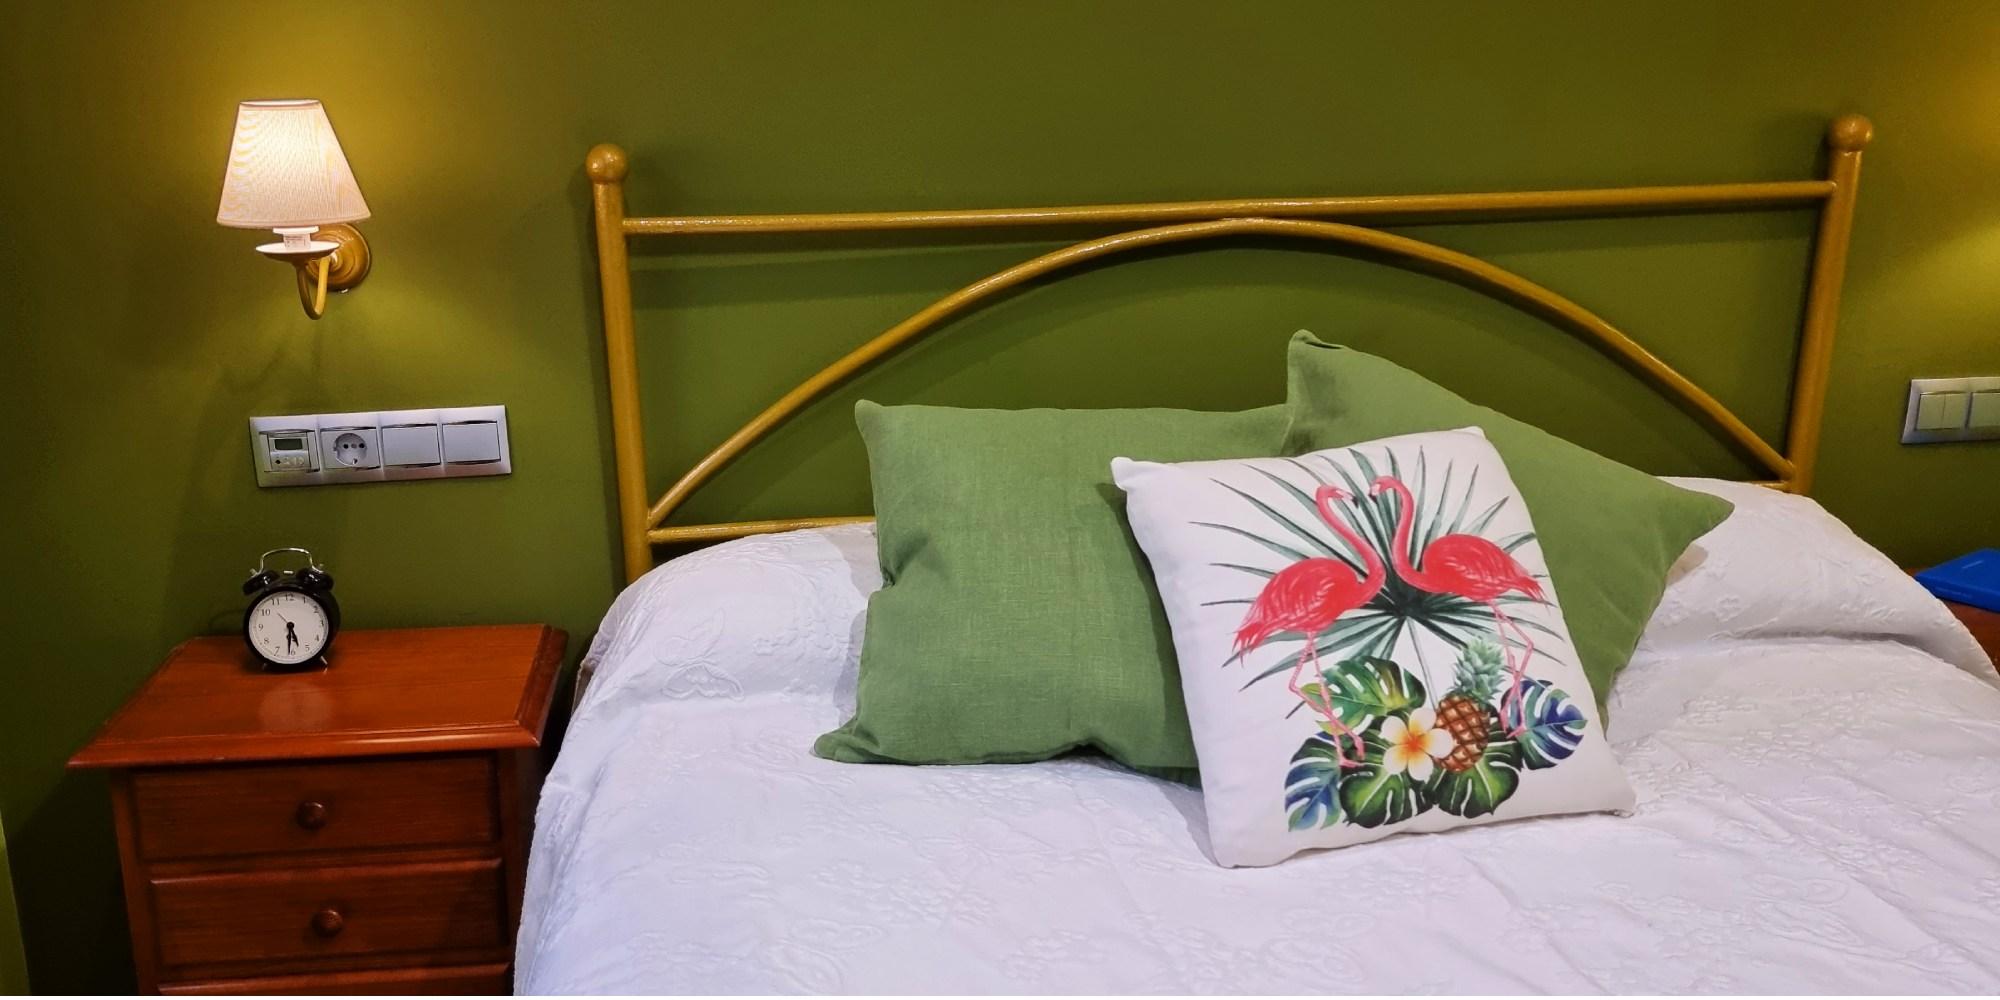 cama-mesilla-dormitorio-casaomillon